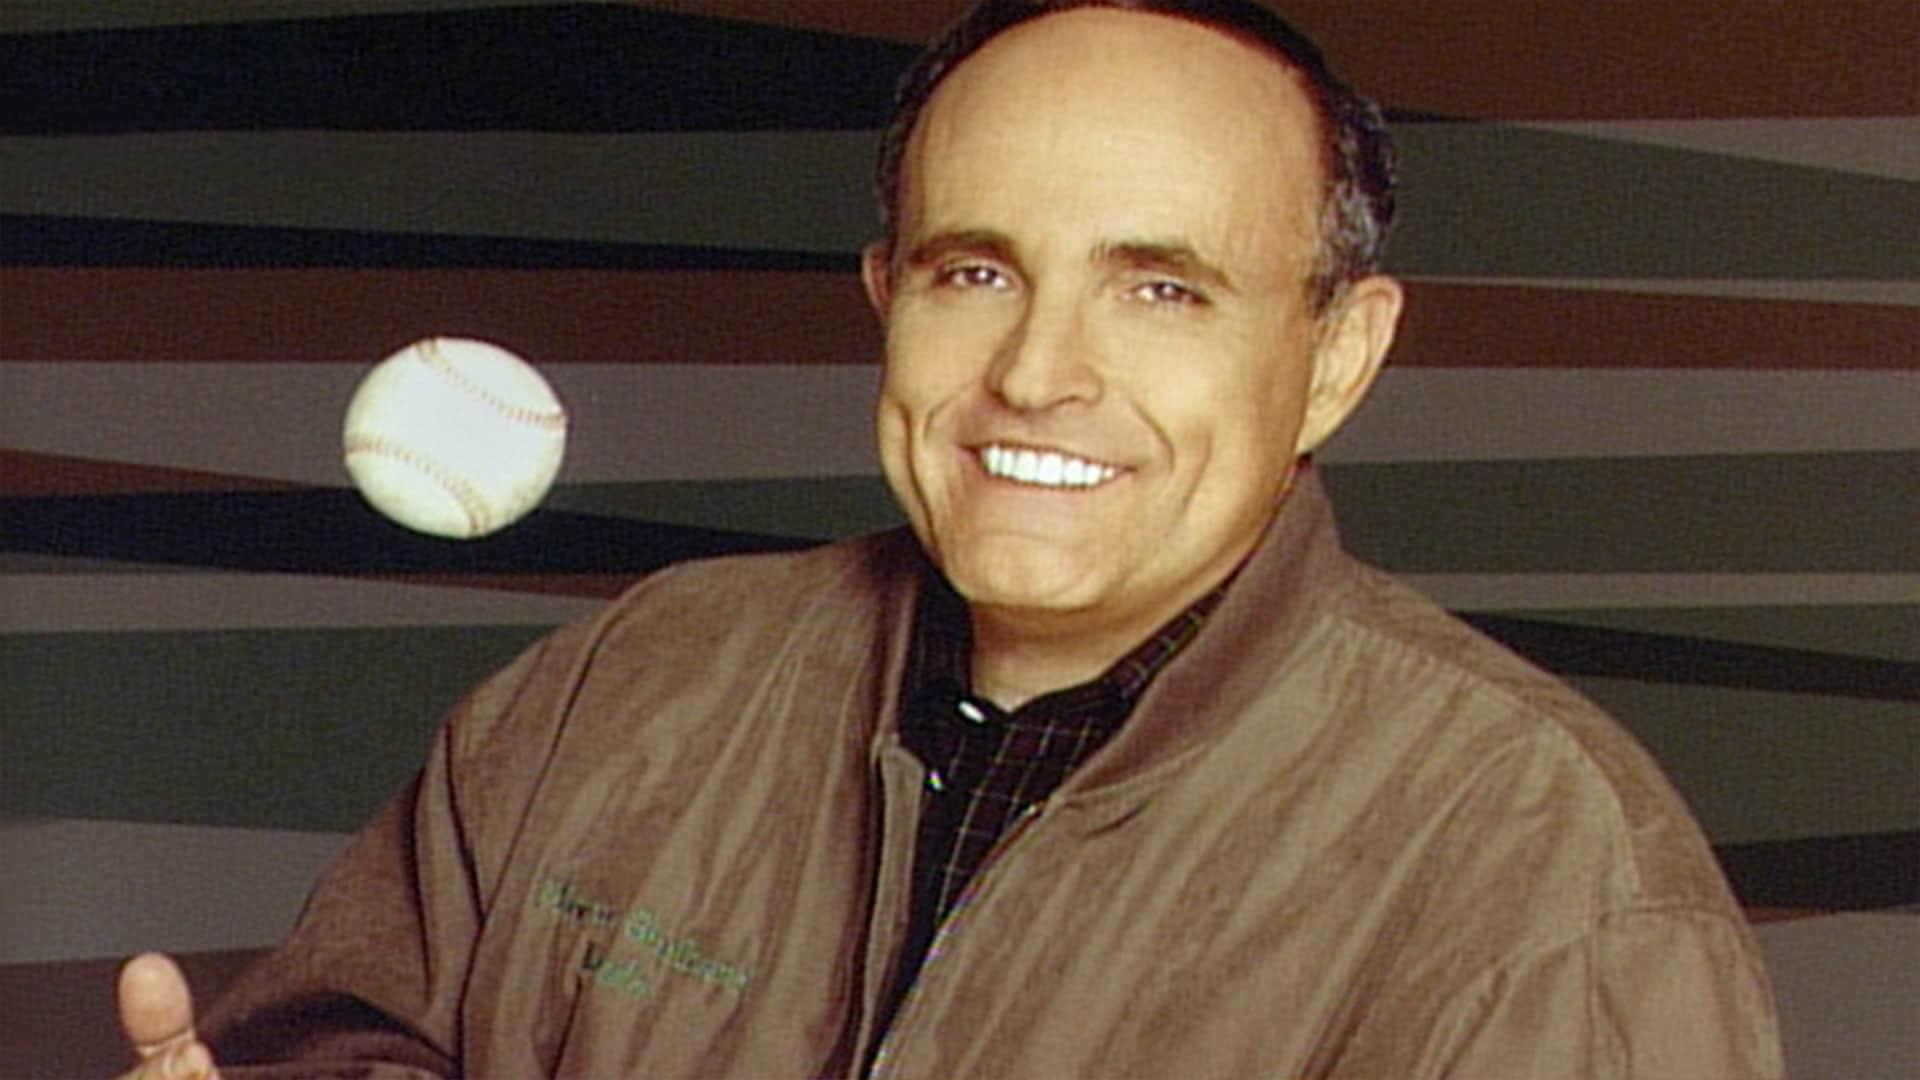 Rudy Giuliani: November 22, 1997